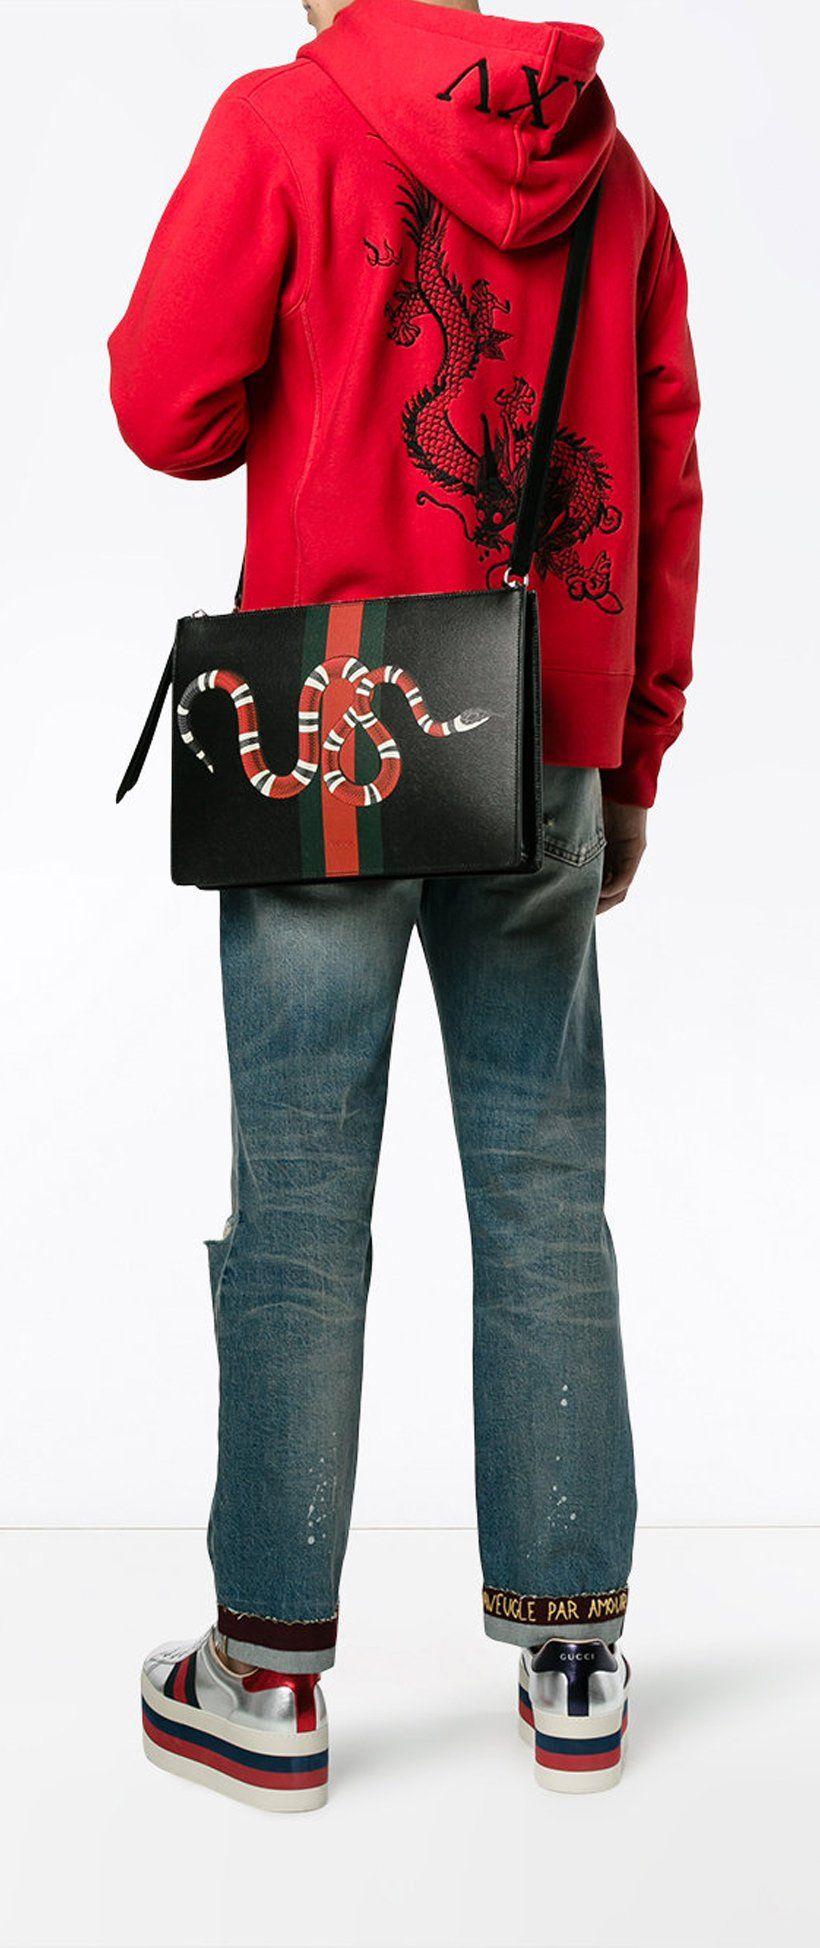 3eb90c9cb2d6 GUCCI web and snake messenger bag, explore new season Gucci on Farfetch now.